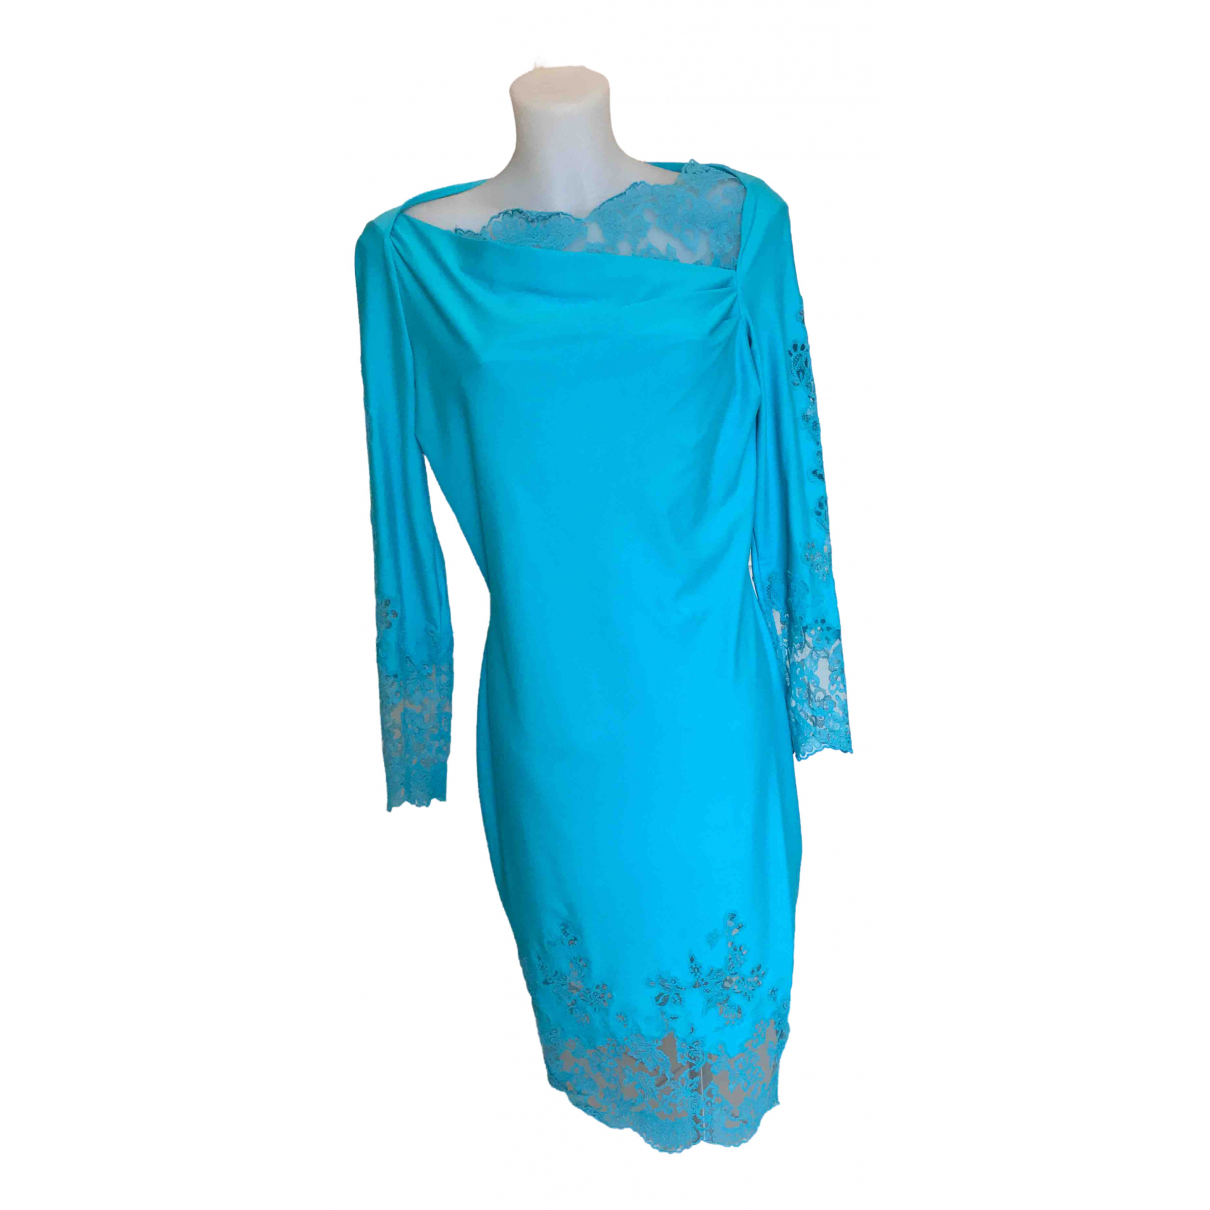 Ermanno Scervino \N Kleid in  Tuerkis Polyester